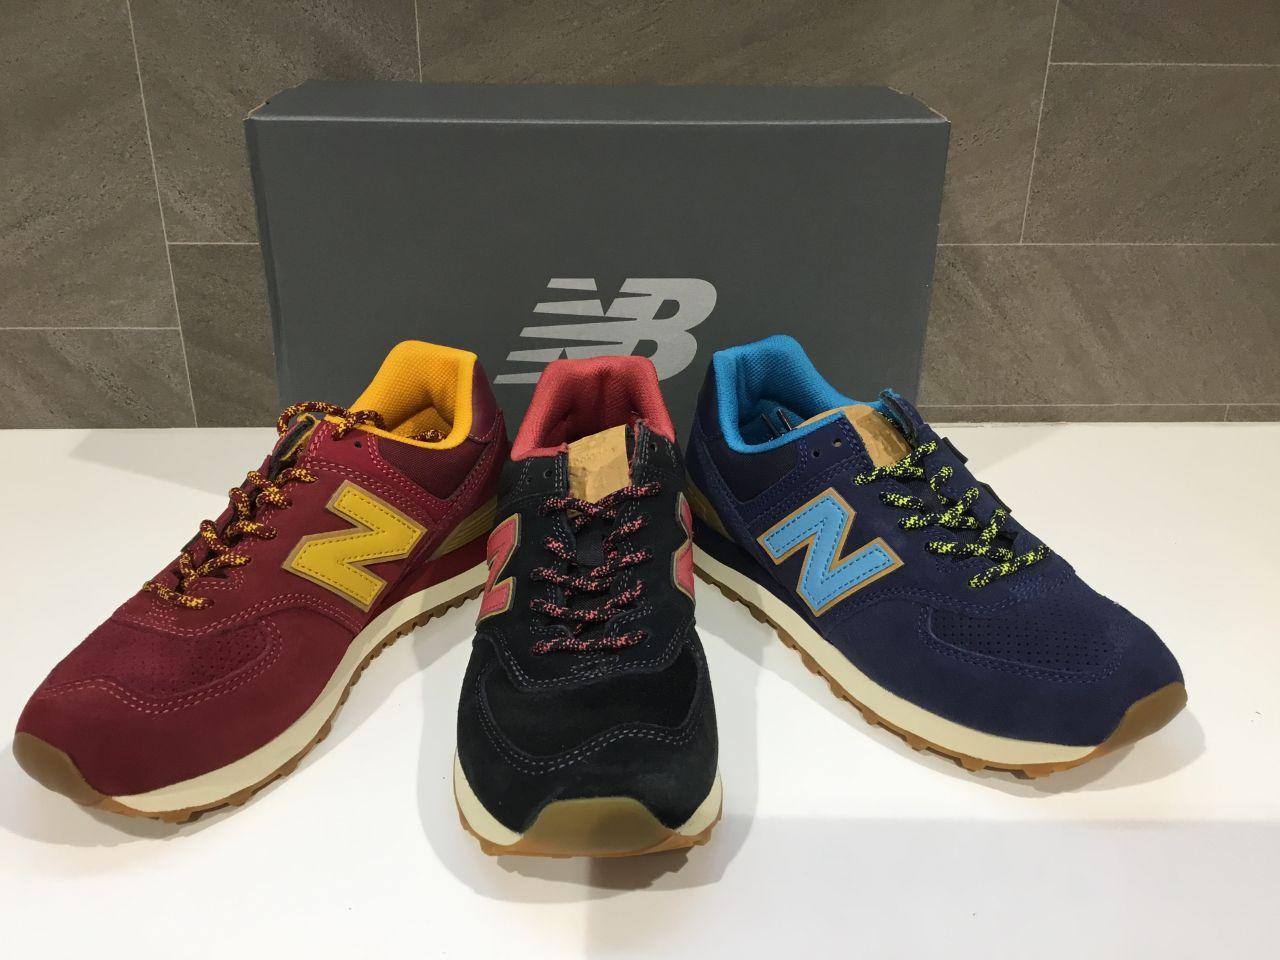 d52bf89c5a1b0 New balance新商品入荷!! | ASBee ミーツ国分寺店 | G-FOOT ...